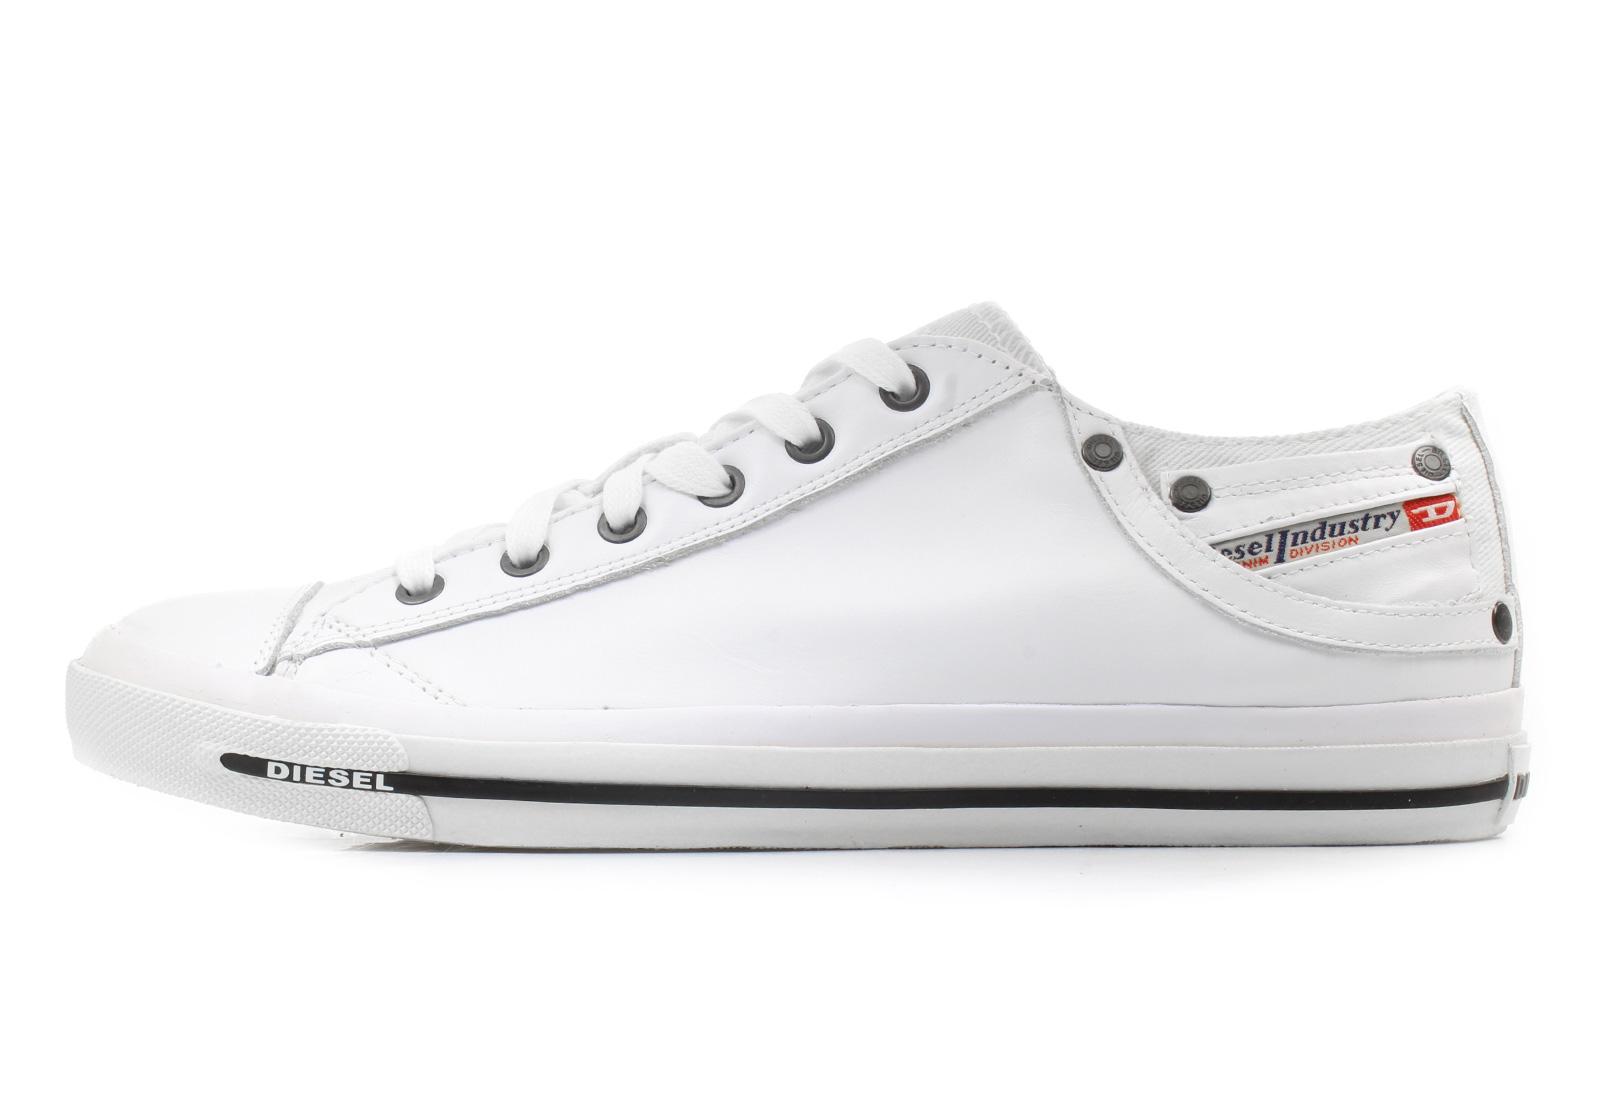 1d0531c49c2e Diesel Cipő - Exposure Low I - 321-052-1003 - Office Shoes Magyarország